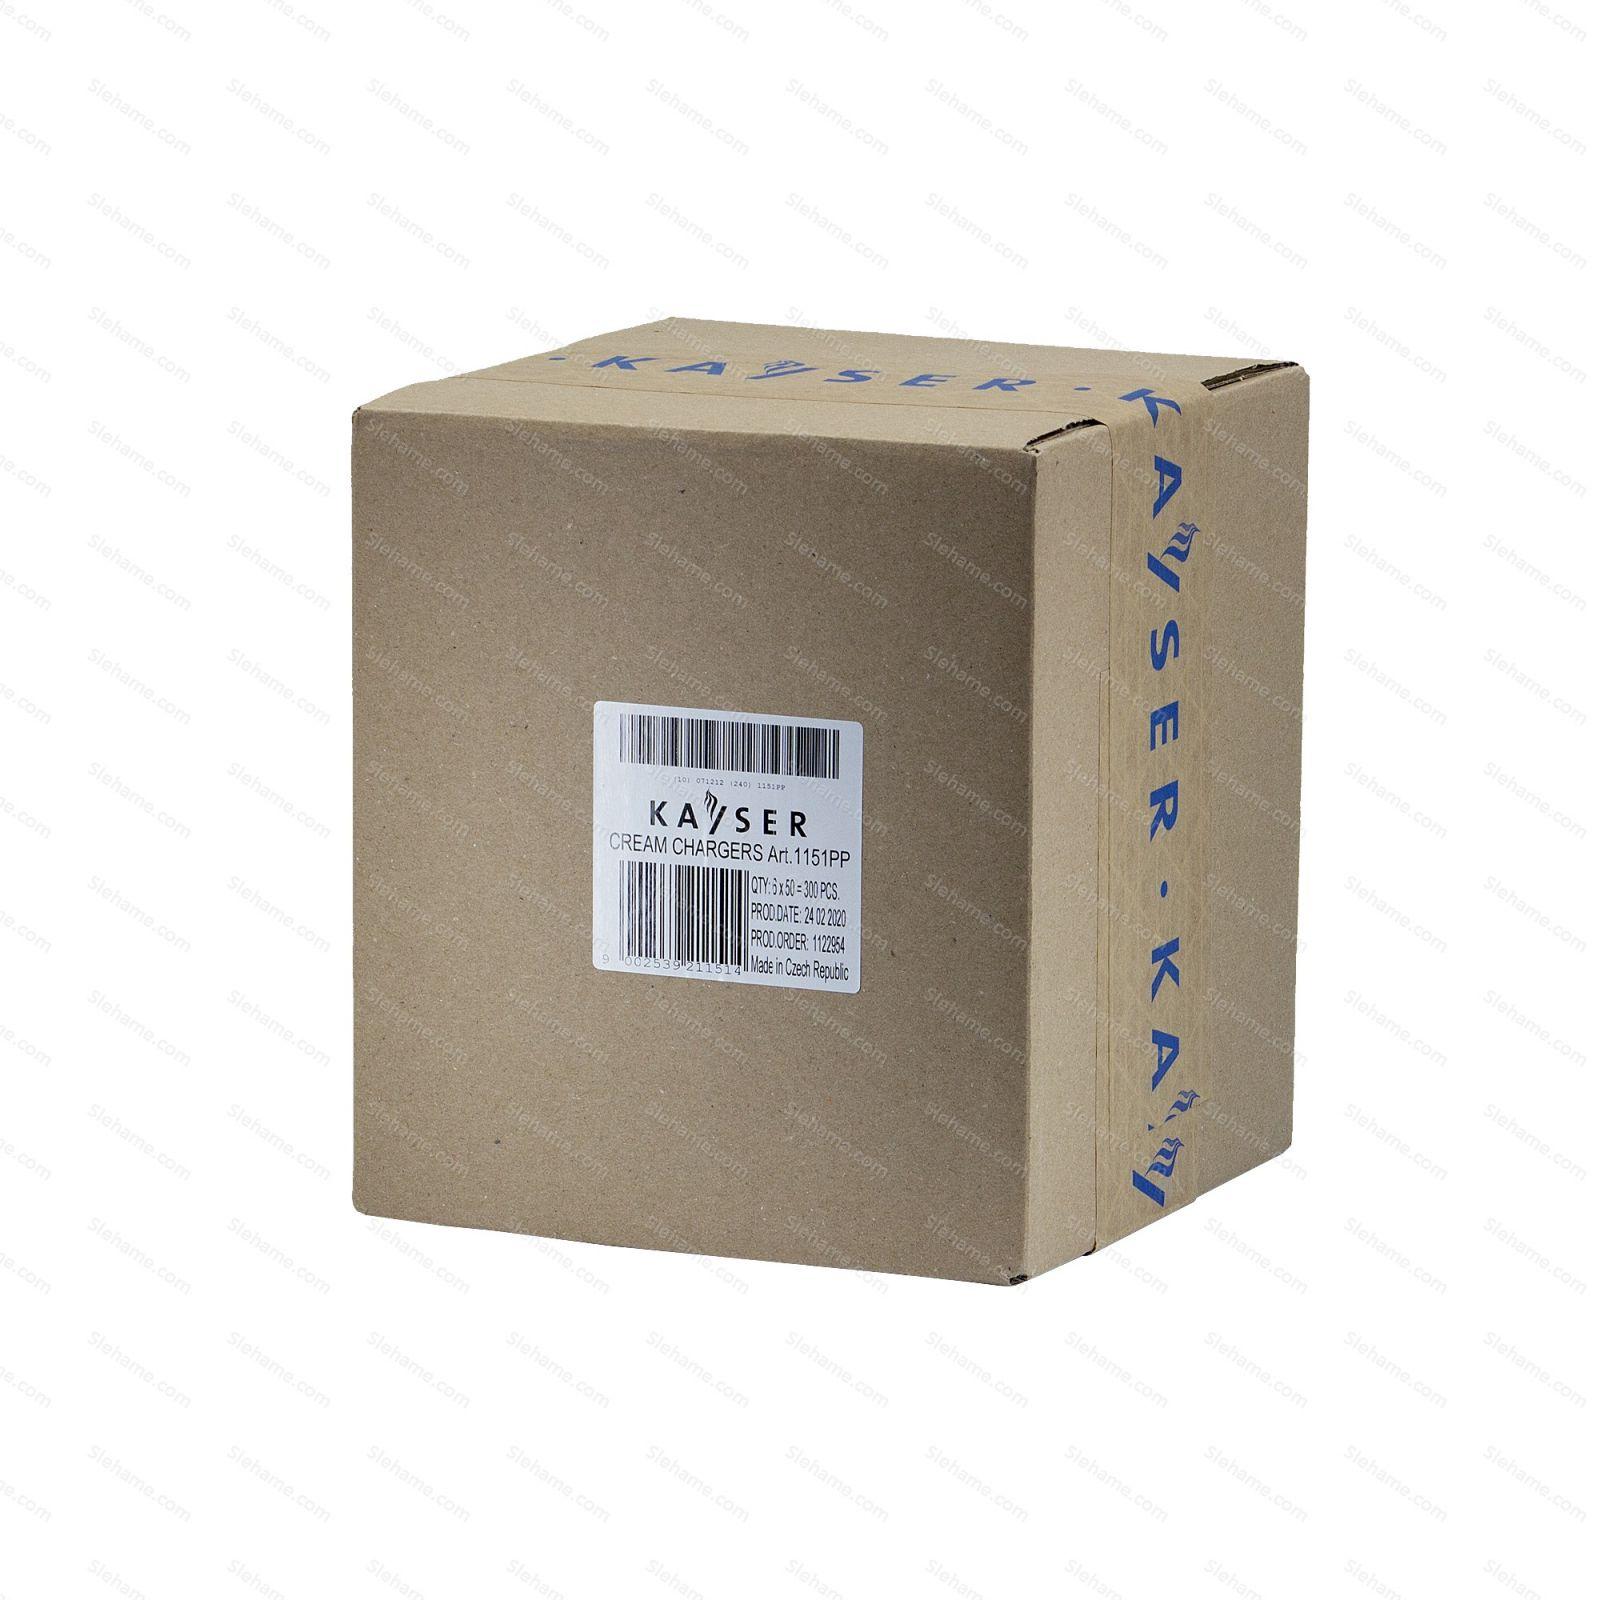 Šlehačkové bombičky Kayser 7.5 g N2O, 50 ks (na jedno použití)